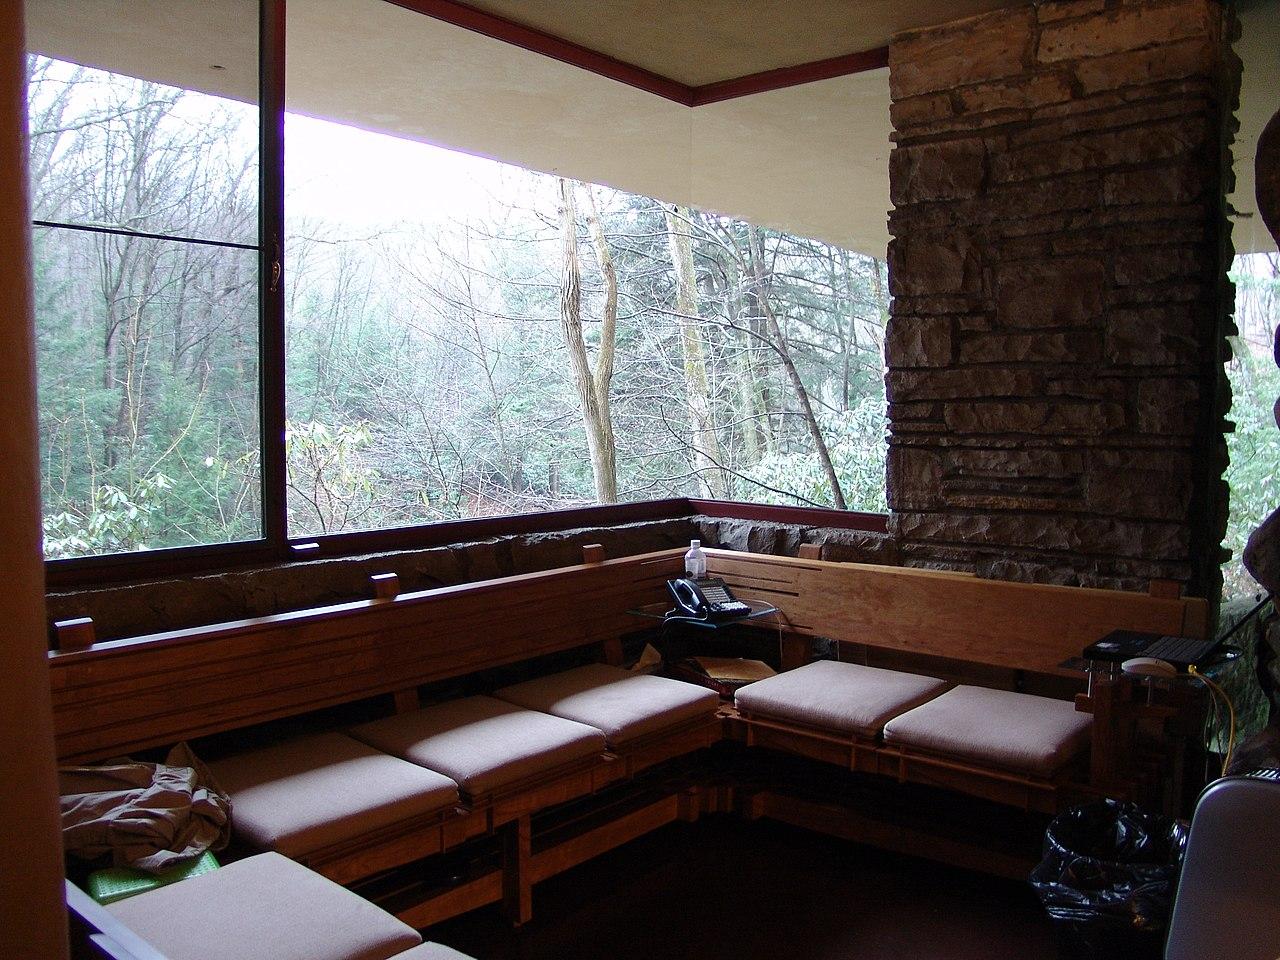 File:Frank Lloyd Wright - Fallingwater interior 2.JPG ...